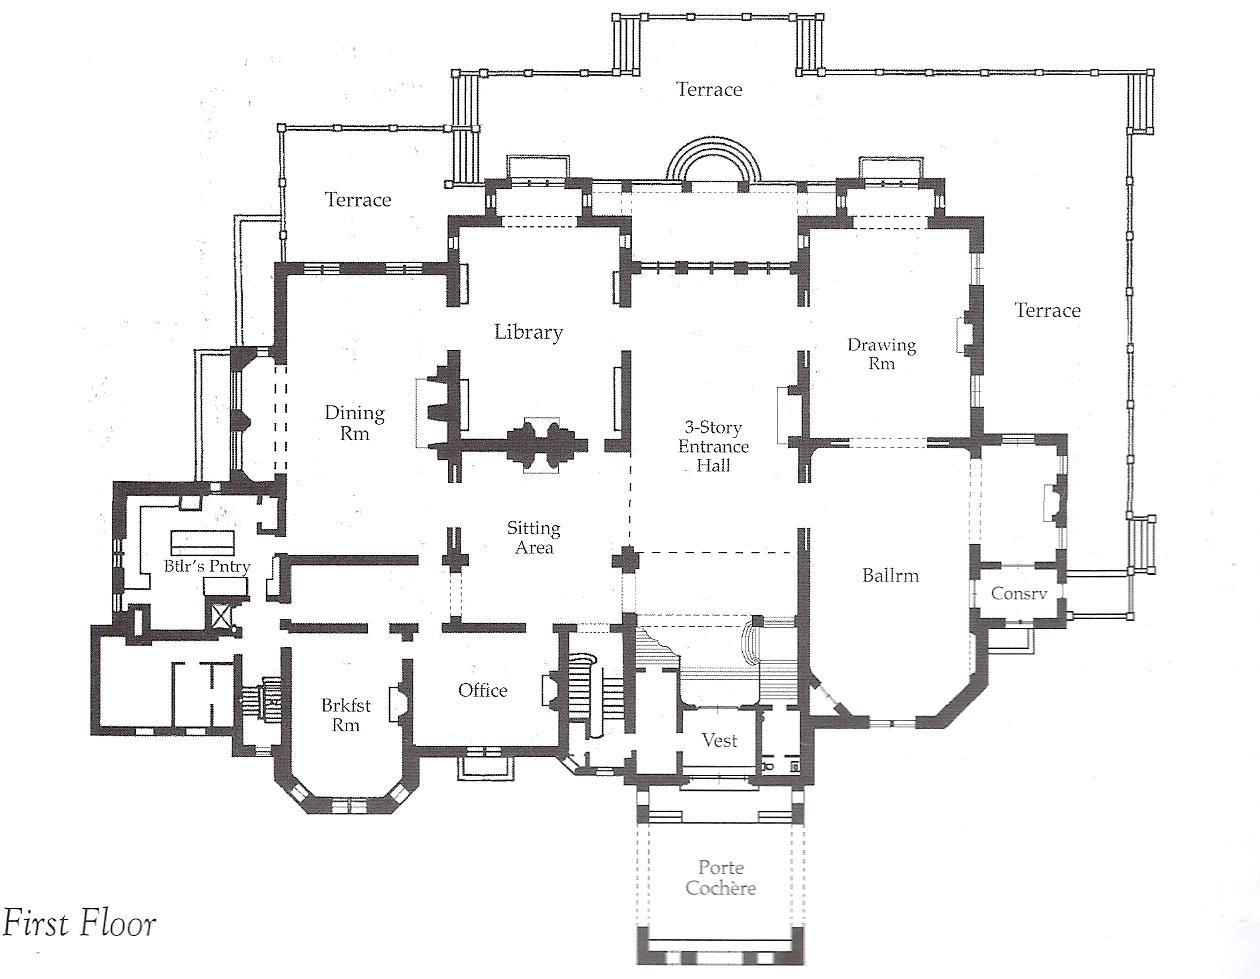 Mansion Floor Plans With Secret Passages Schmidt Gallery